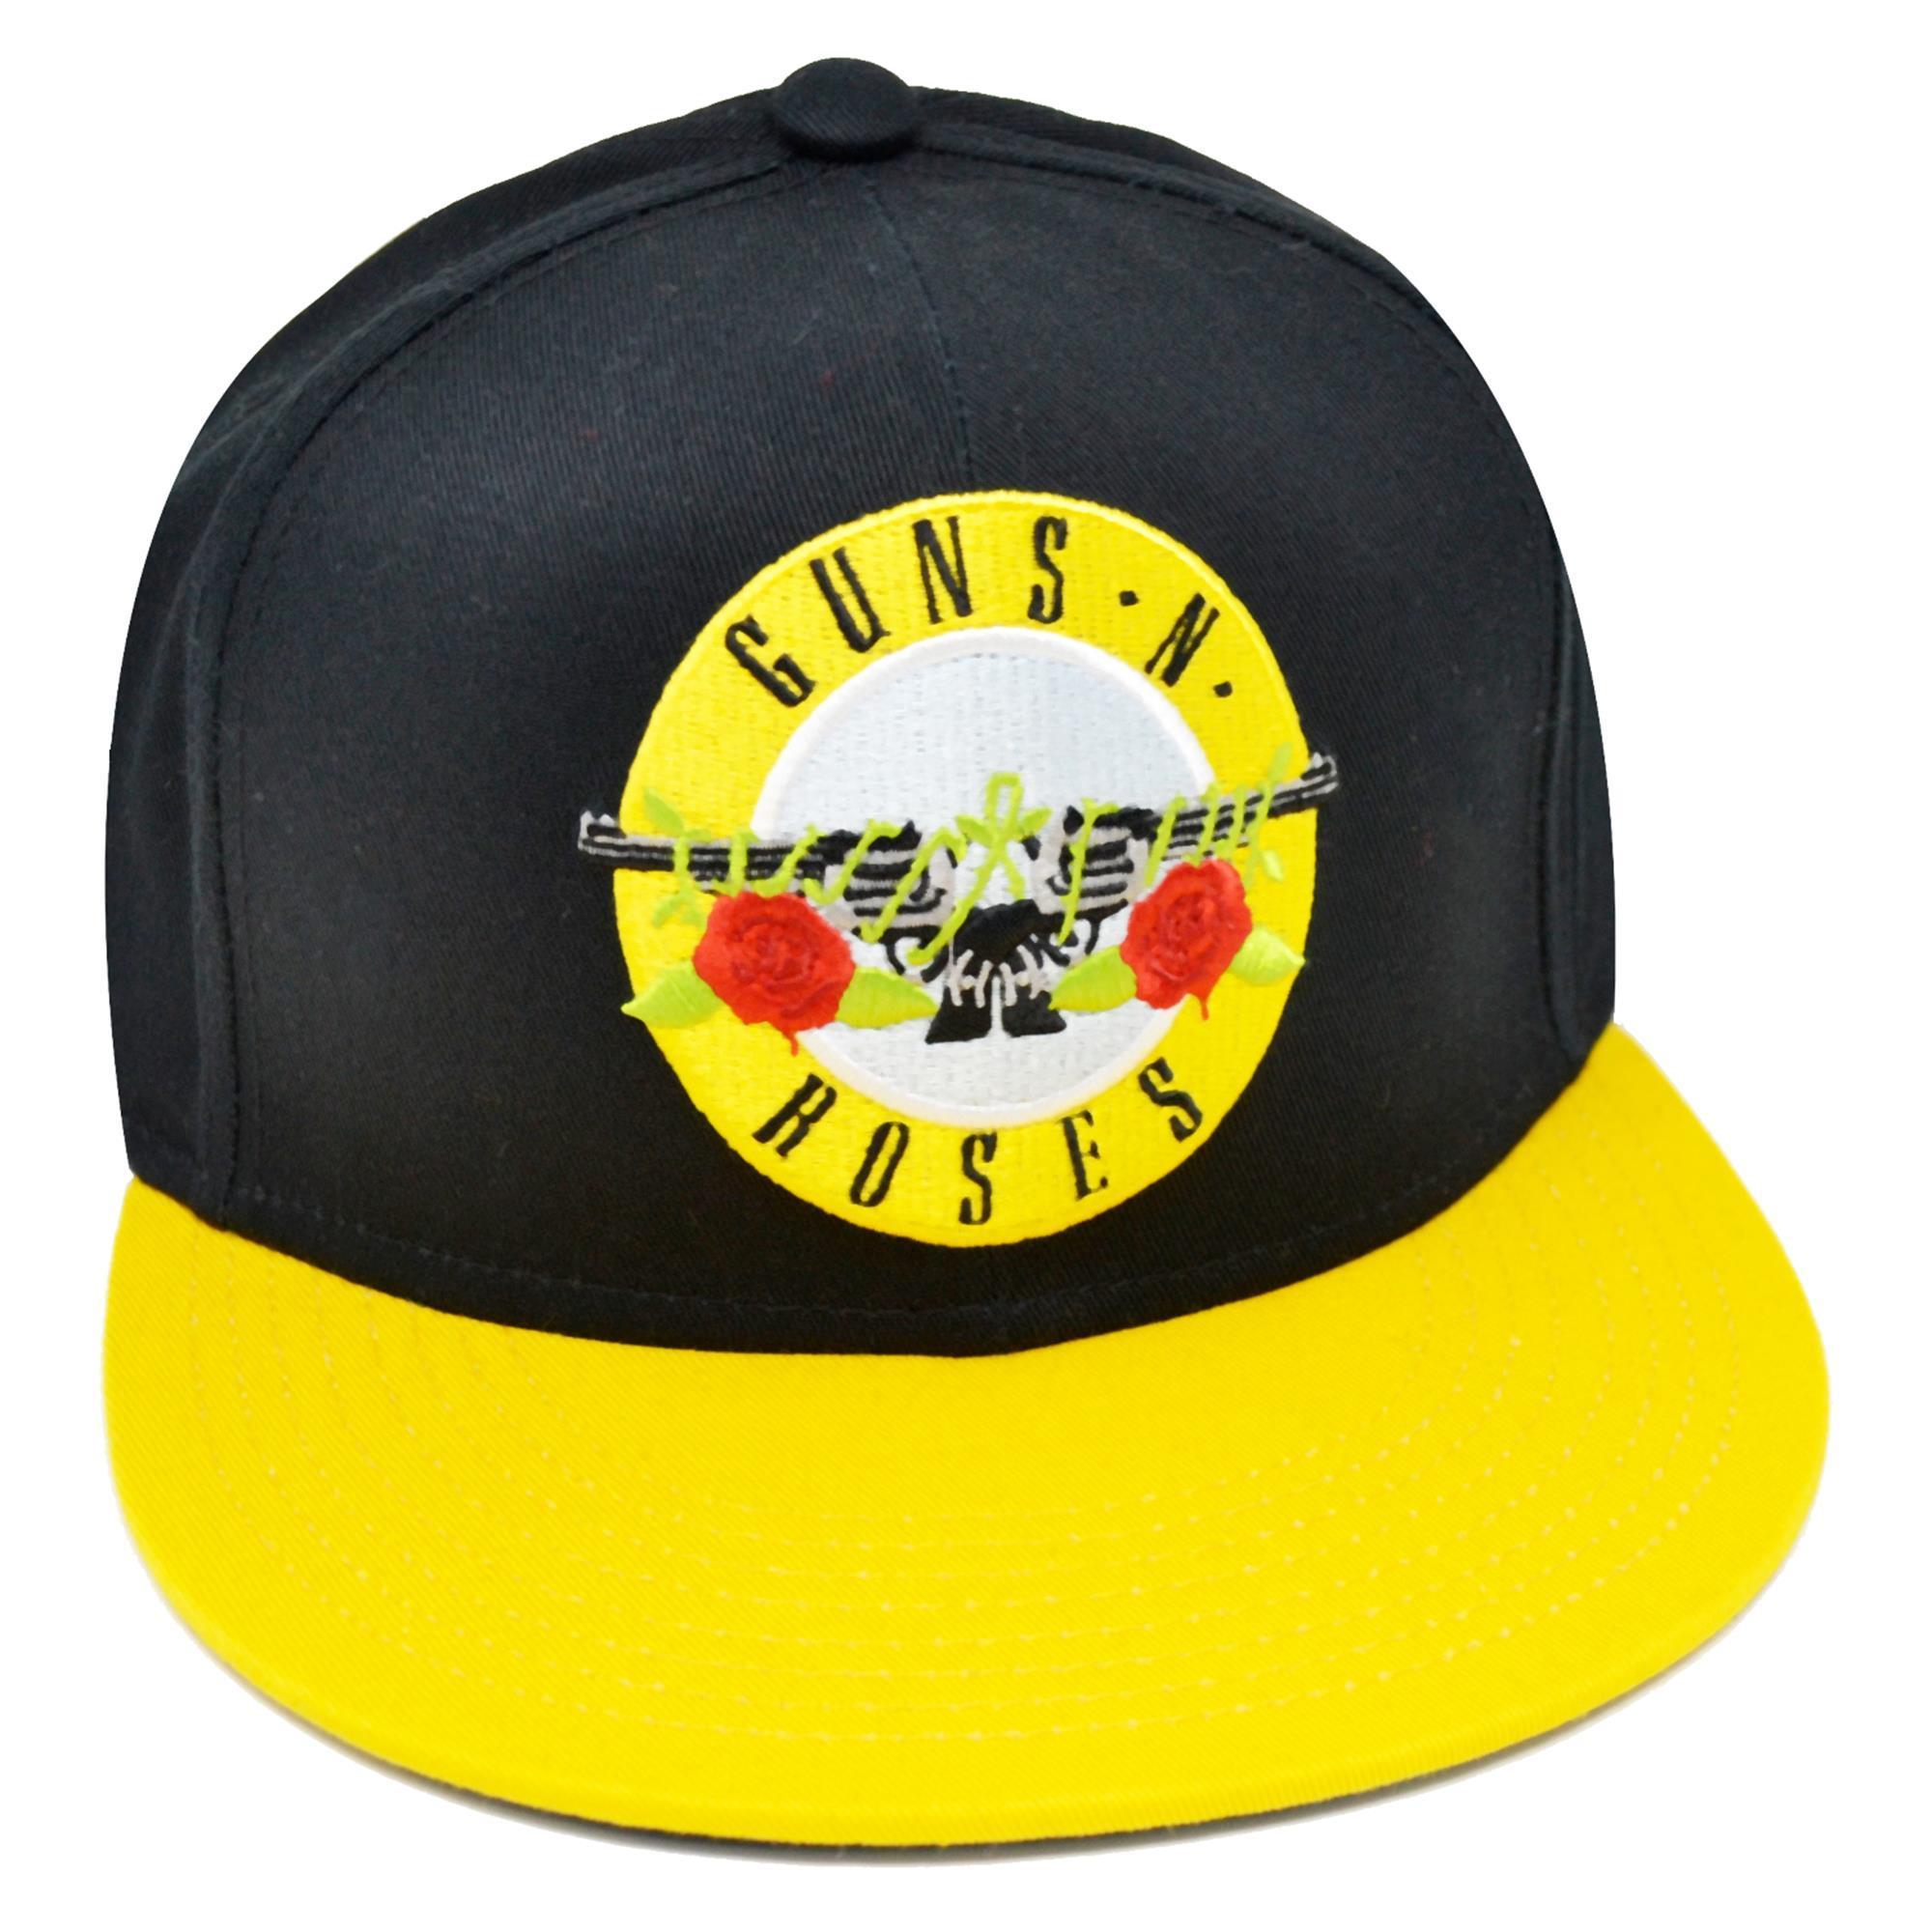 Pistols & Roses Yellow Snapback